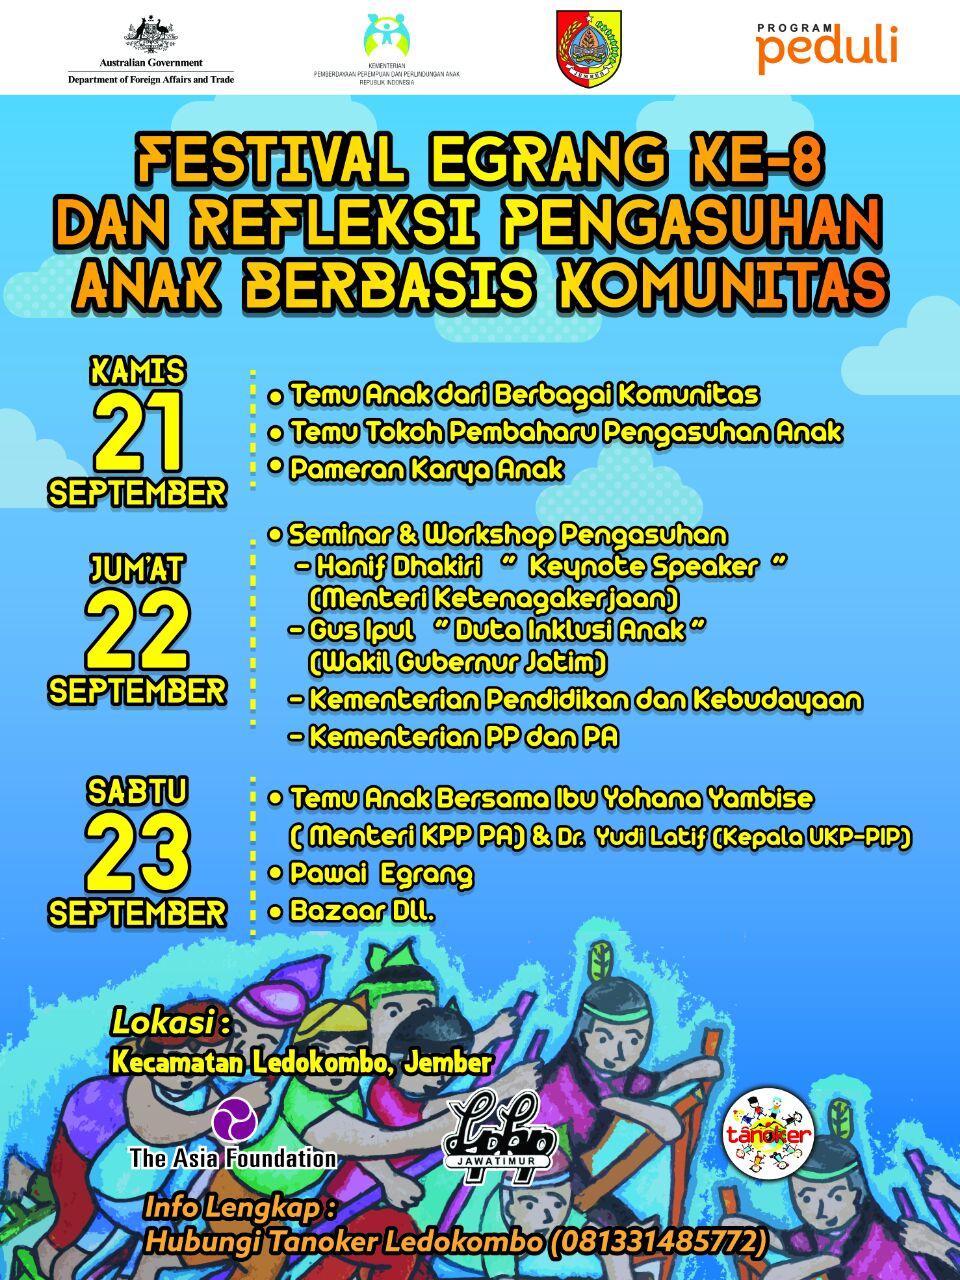 Menteri Hadir Bupati Faida Deklarasikan Jember Kabupaten Layak Anak Festival